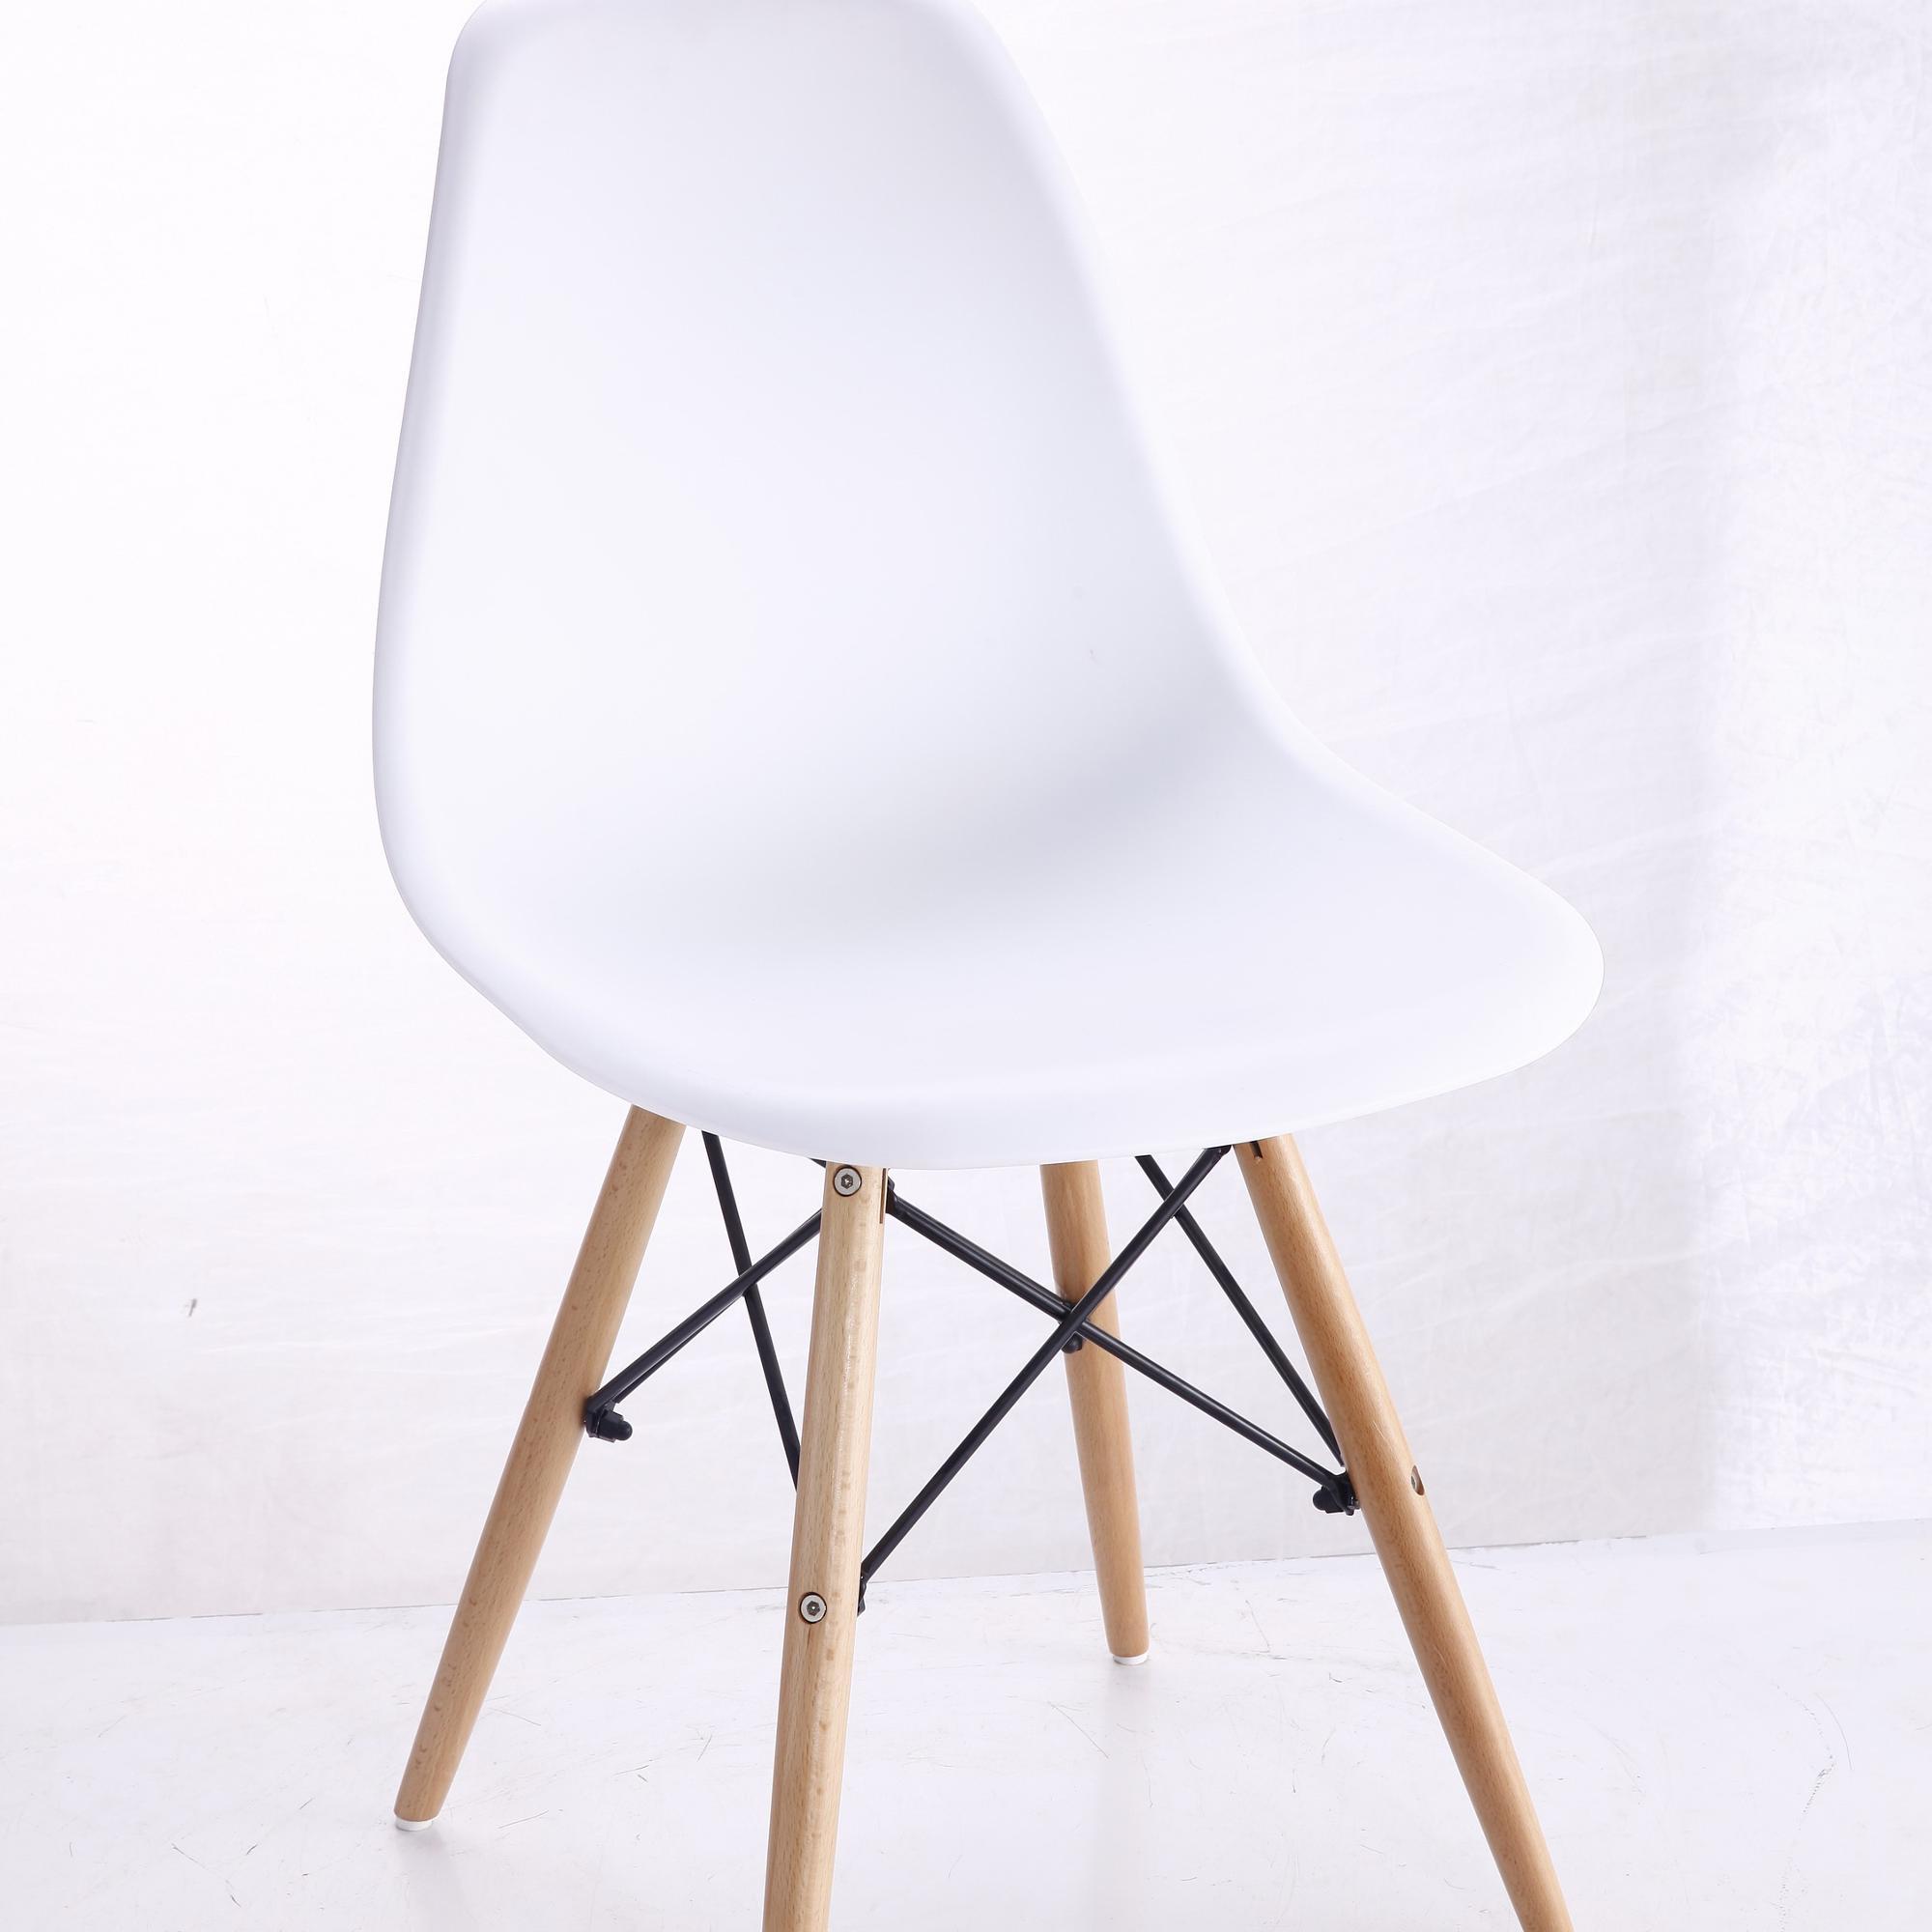 Cheap White Kitchen Plastic Chair With Wooden Legs / Restaurant